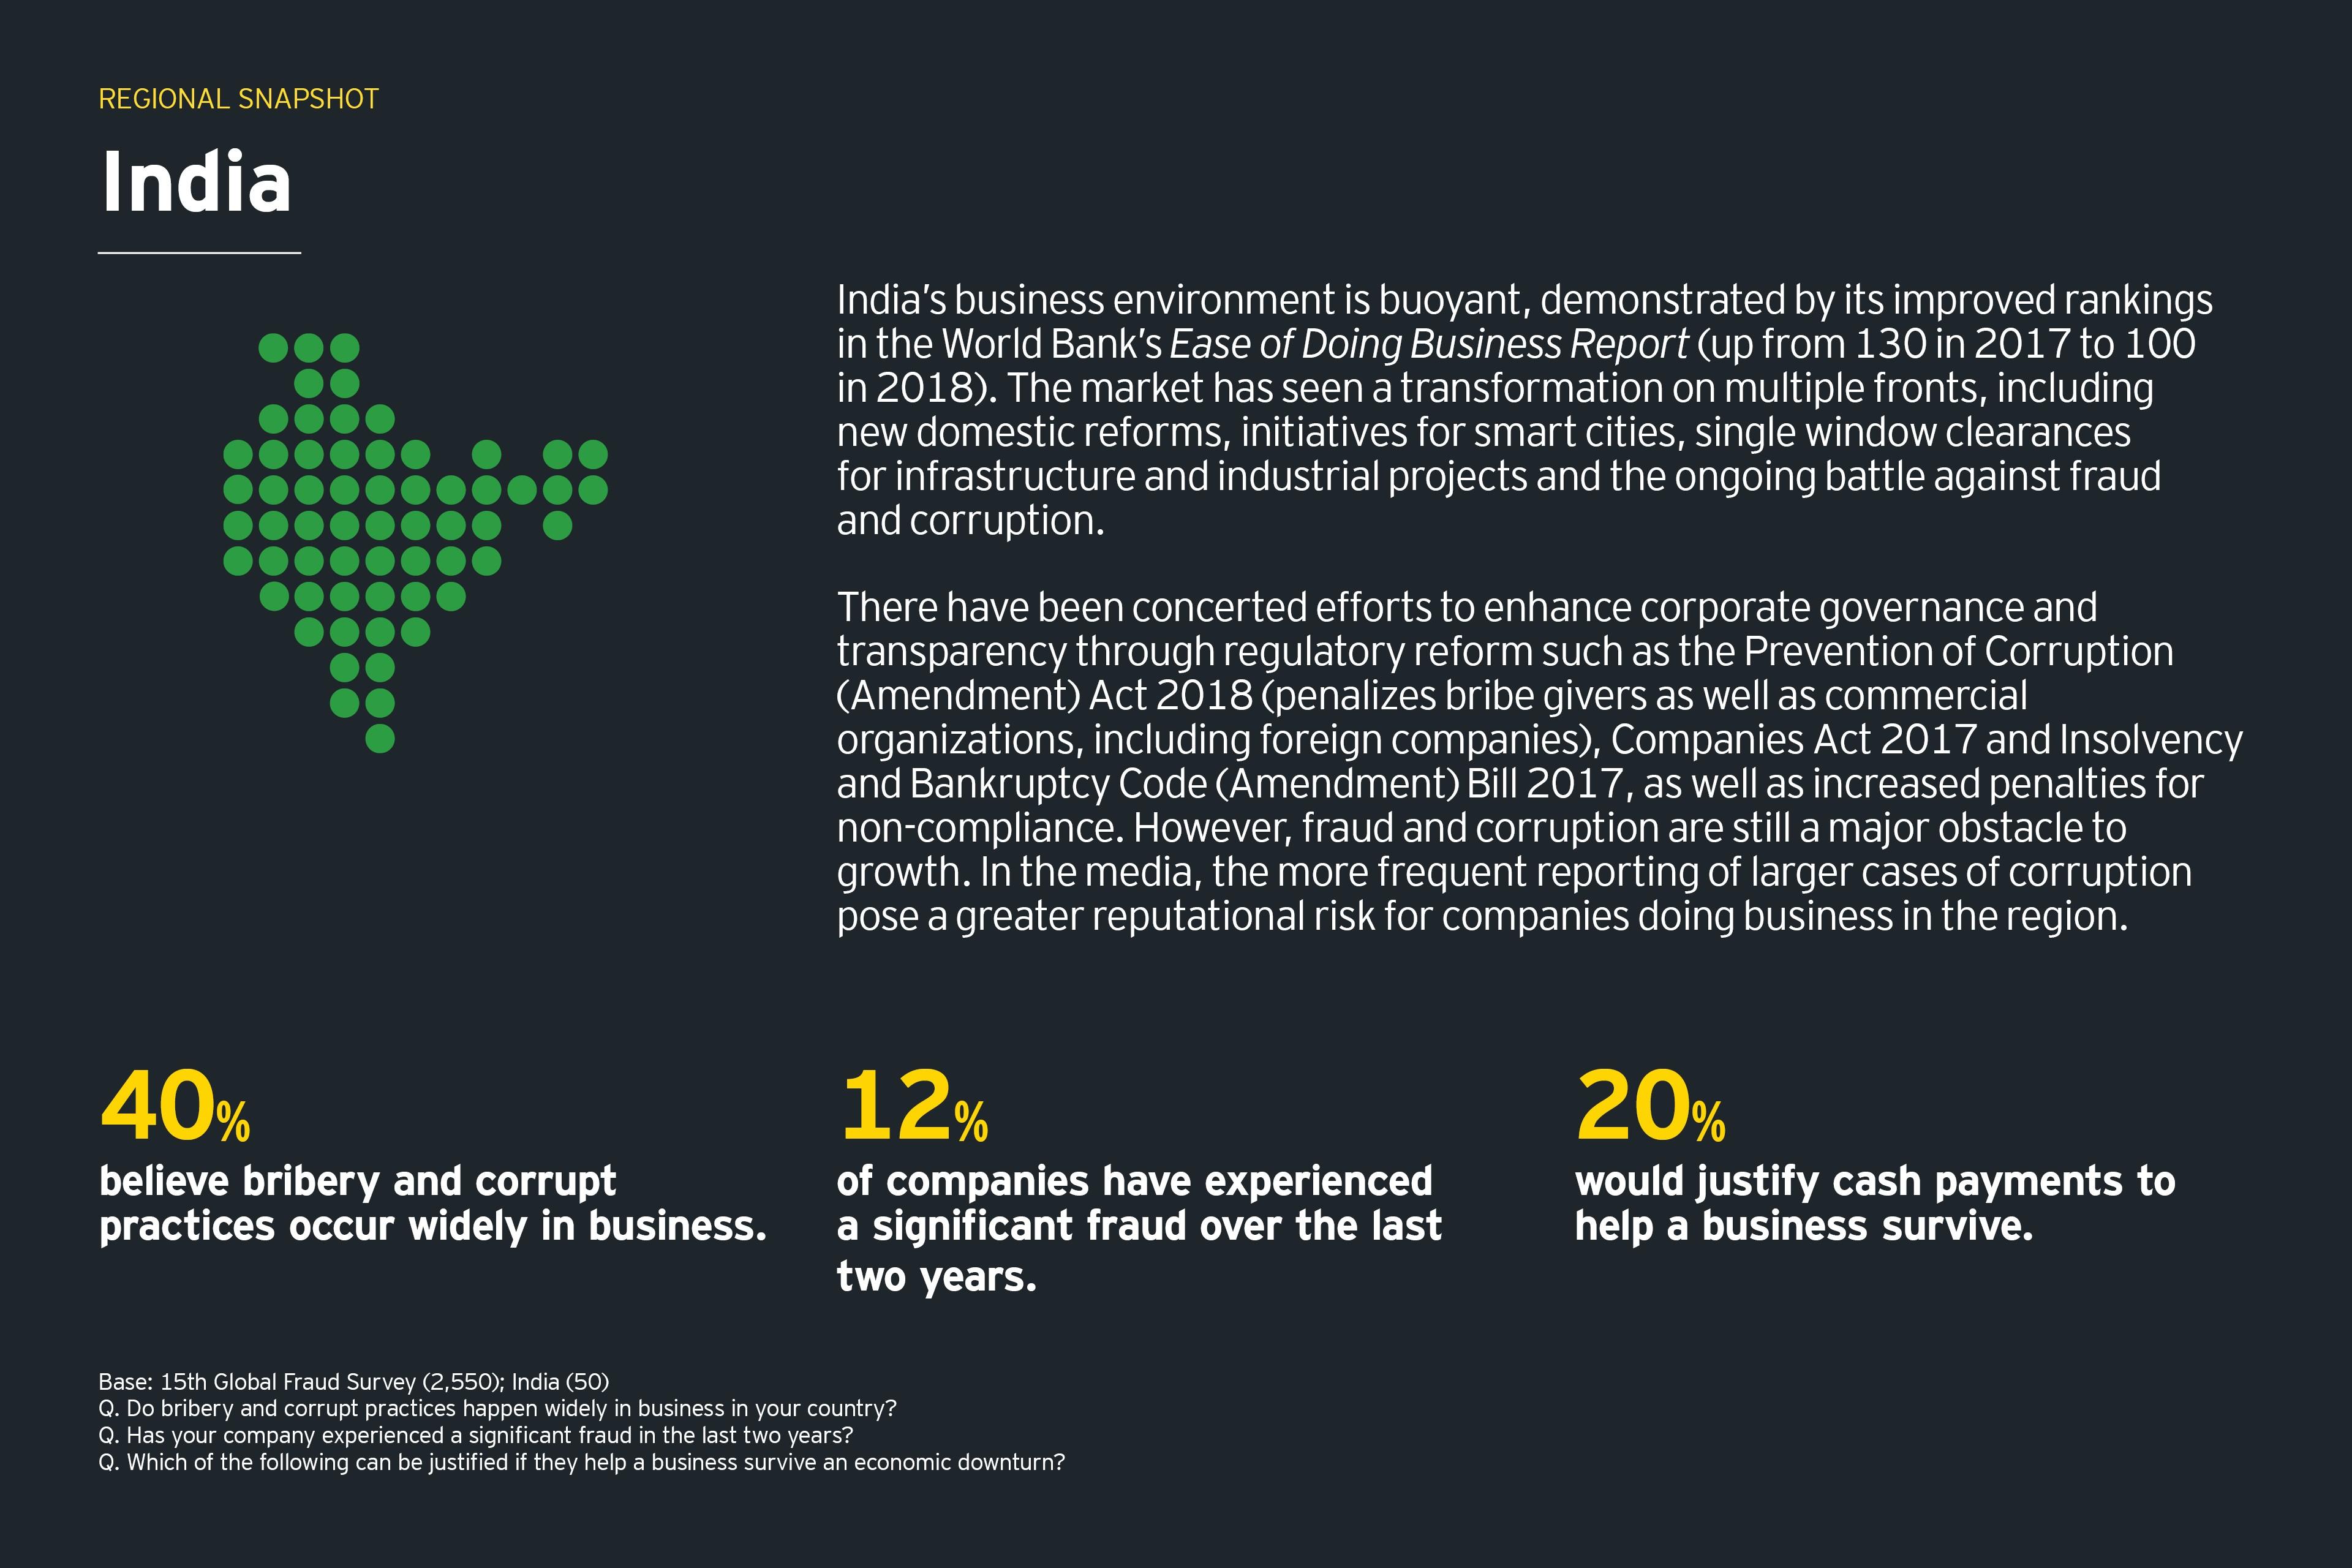 mercados emergentes-Índia